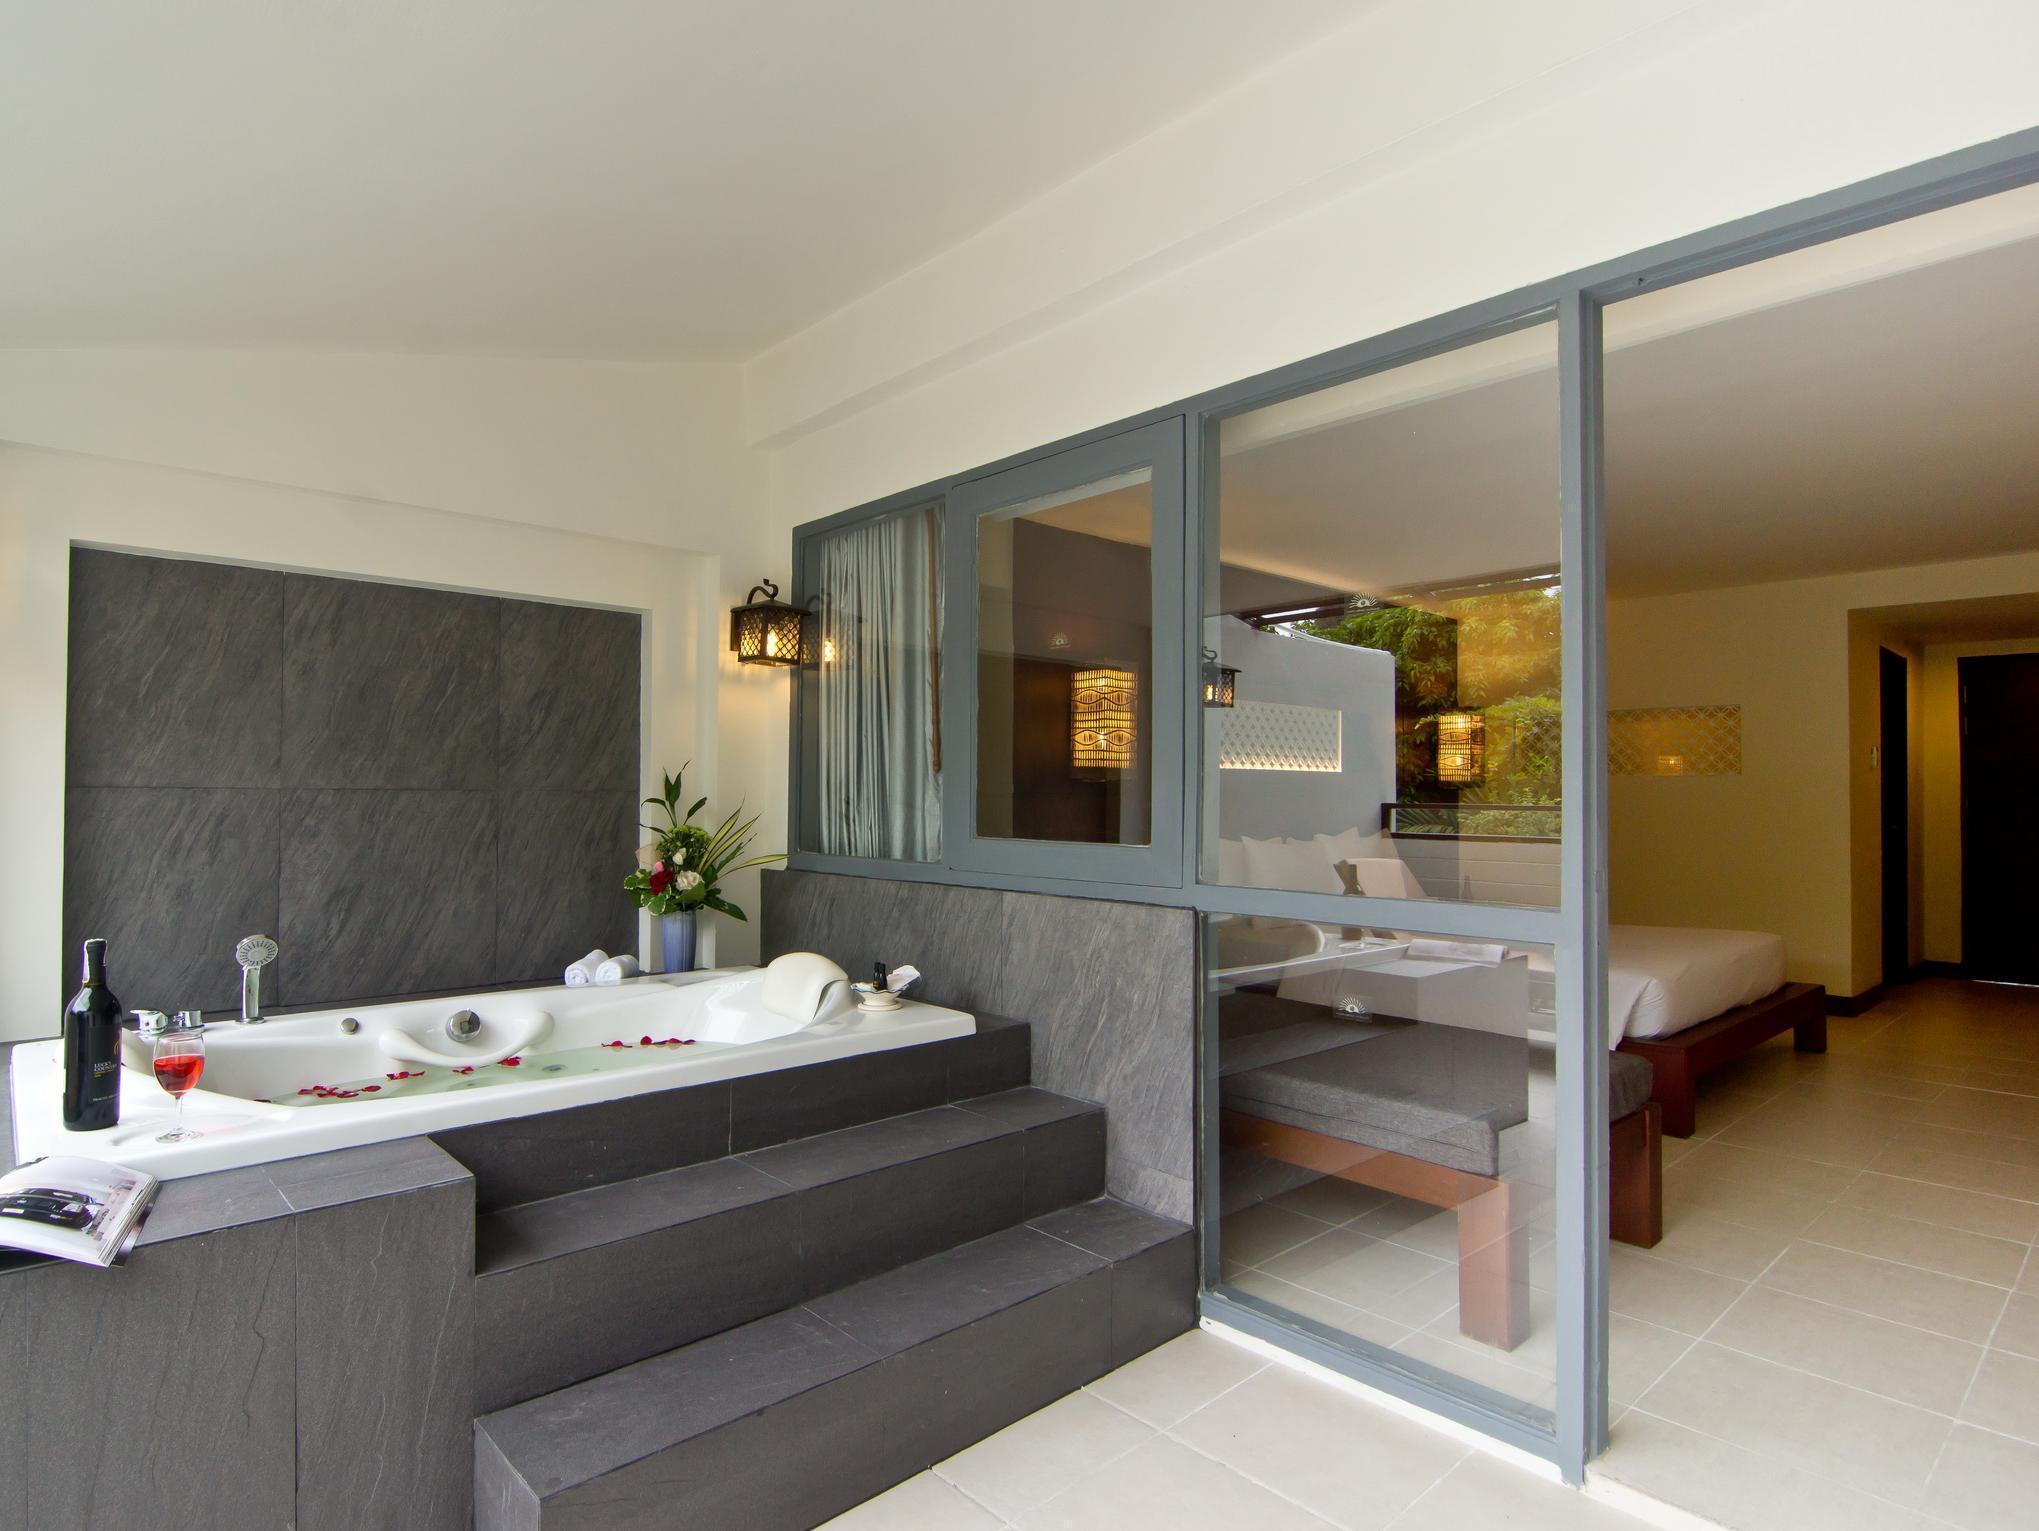 Sunshine Garden Resort ซันไชน์ การ์เดน รีสอร์ท